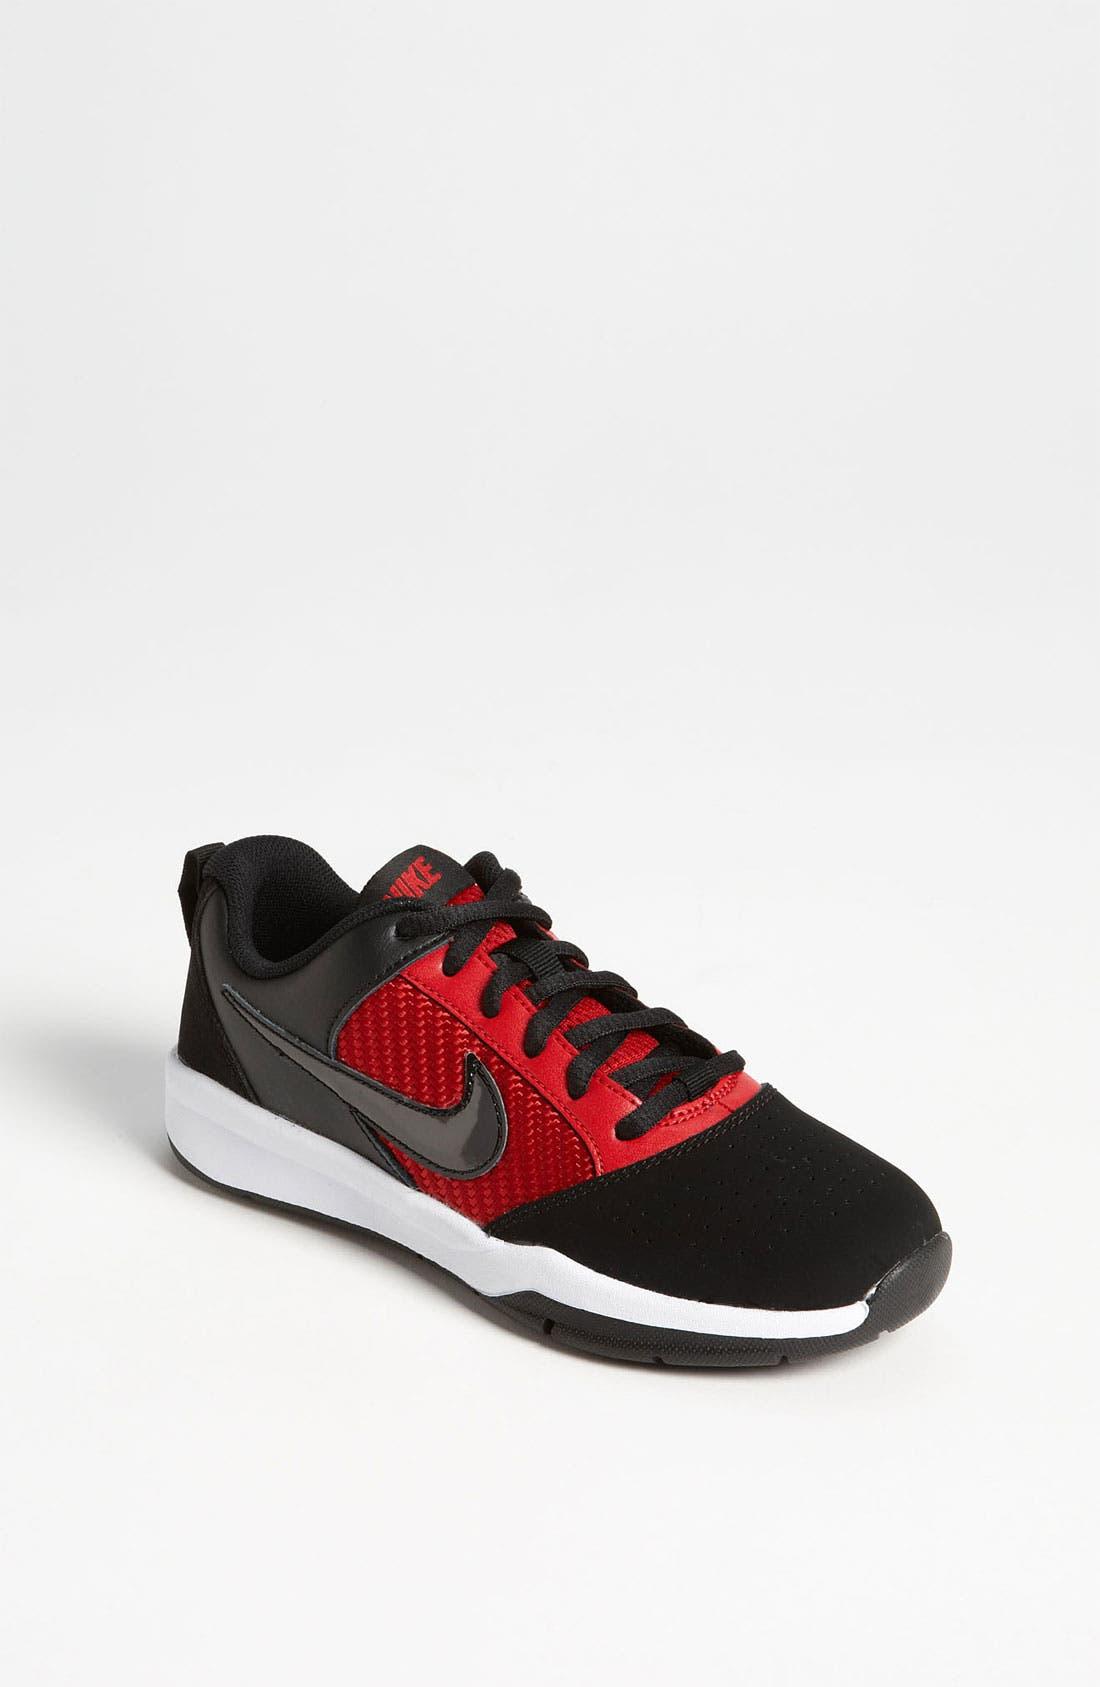 Alternate Image 1 Selected - Nike 'Quick Baller Low' Sneaker (Toddler & Little Kid)